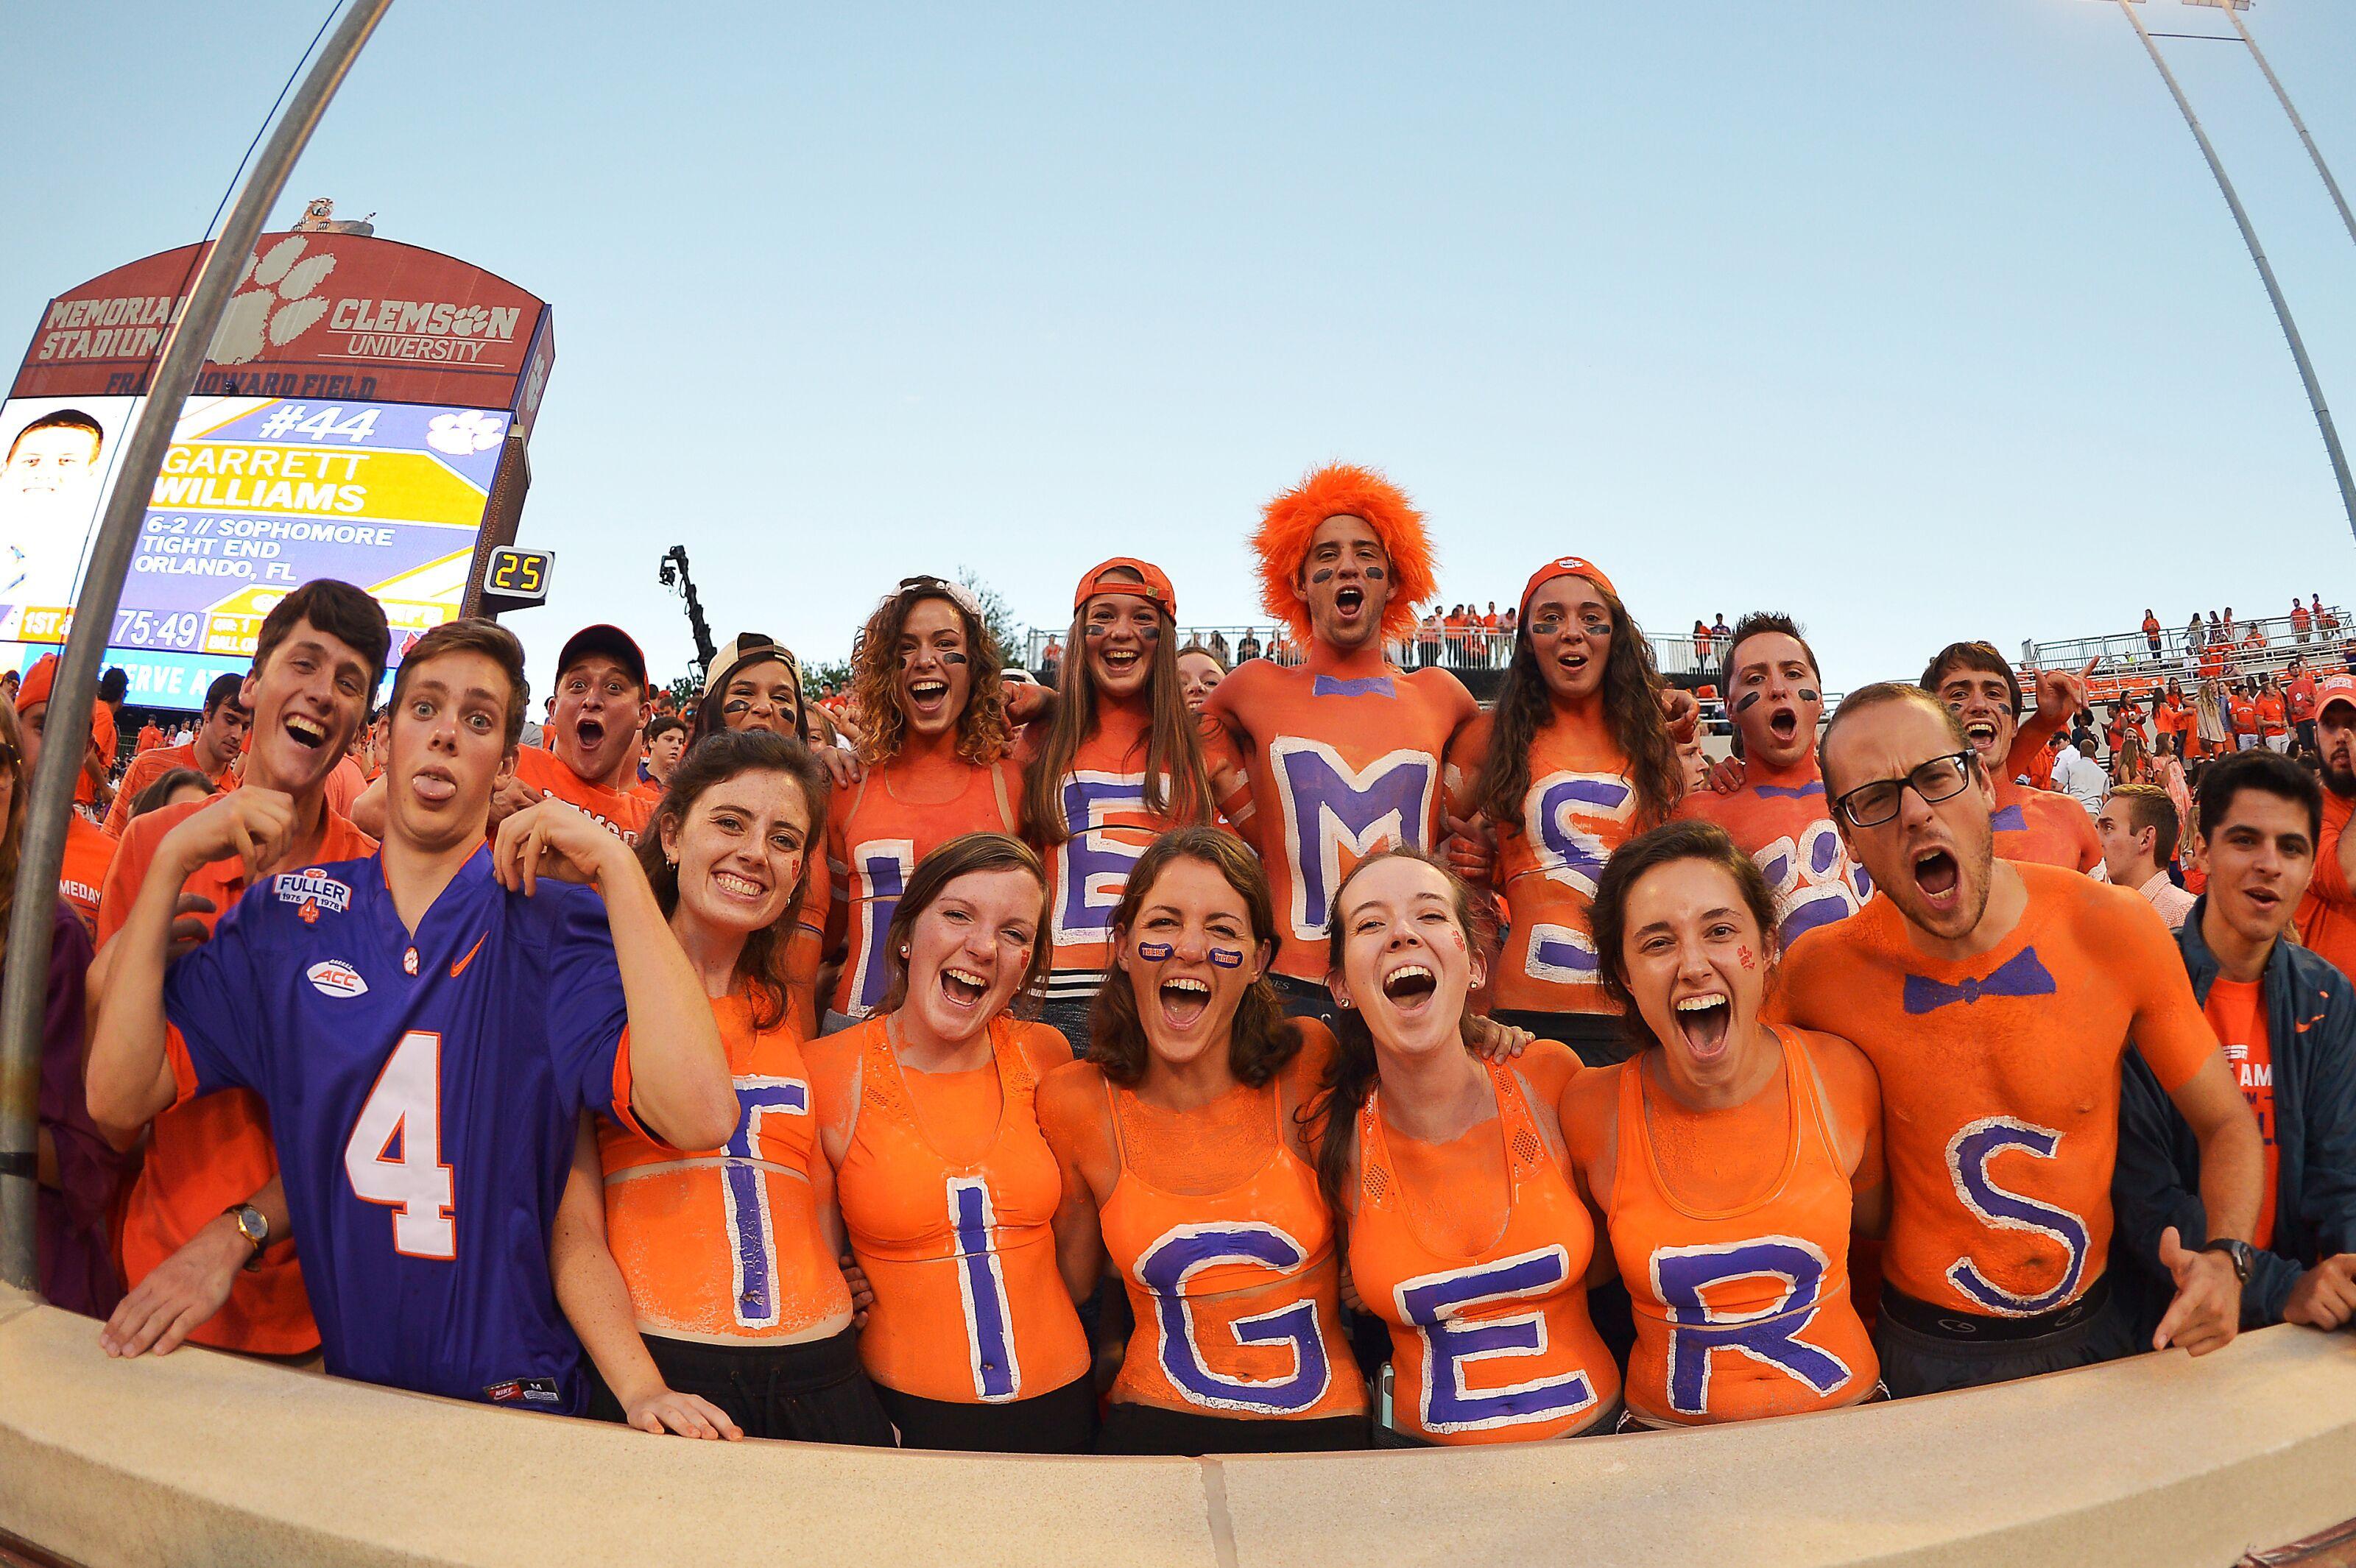 Clemson Football Cardi B Wants Her Own Tiger Jersey